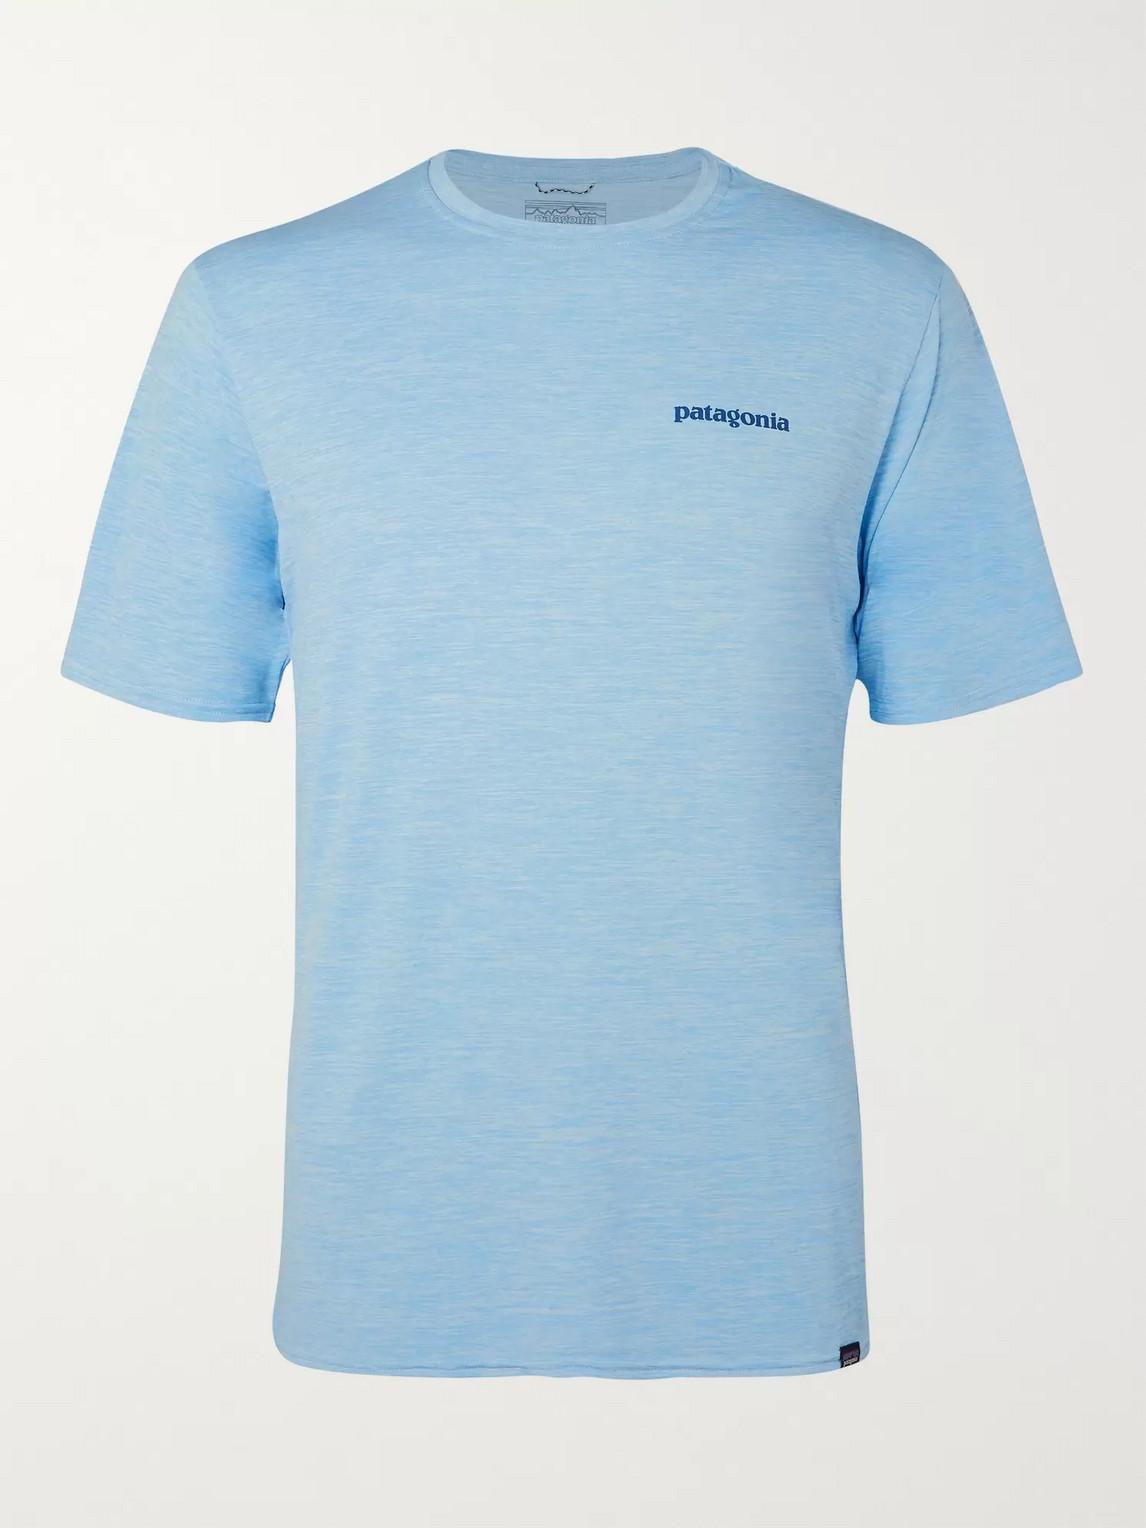 patagonia - logo-print mélange capilene jersey t-shirt - men - blue